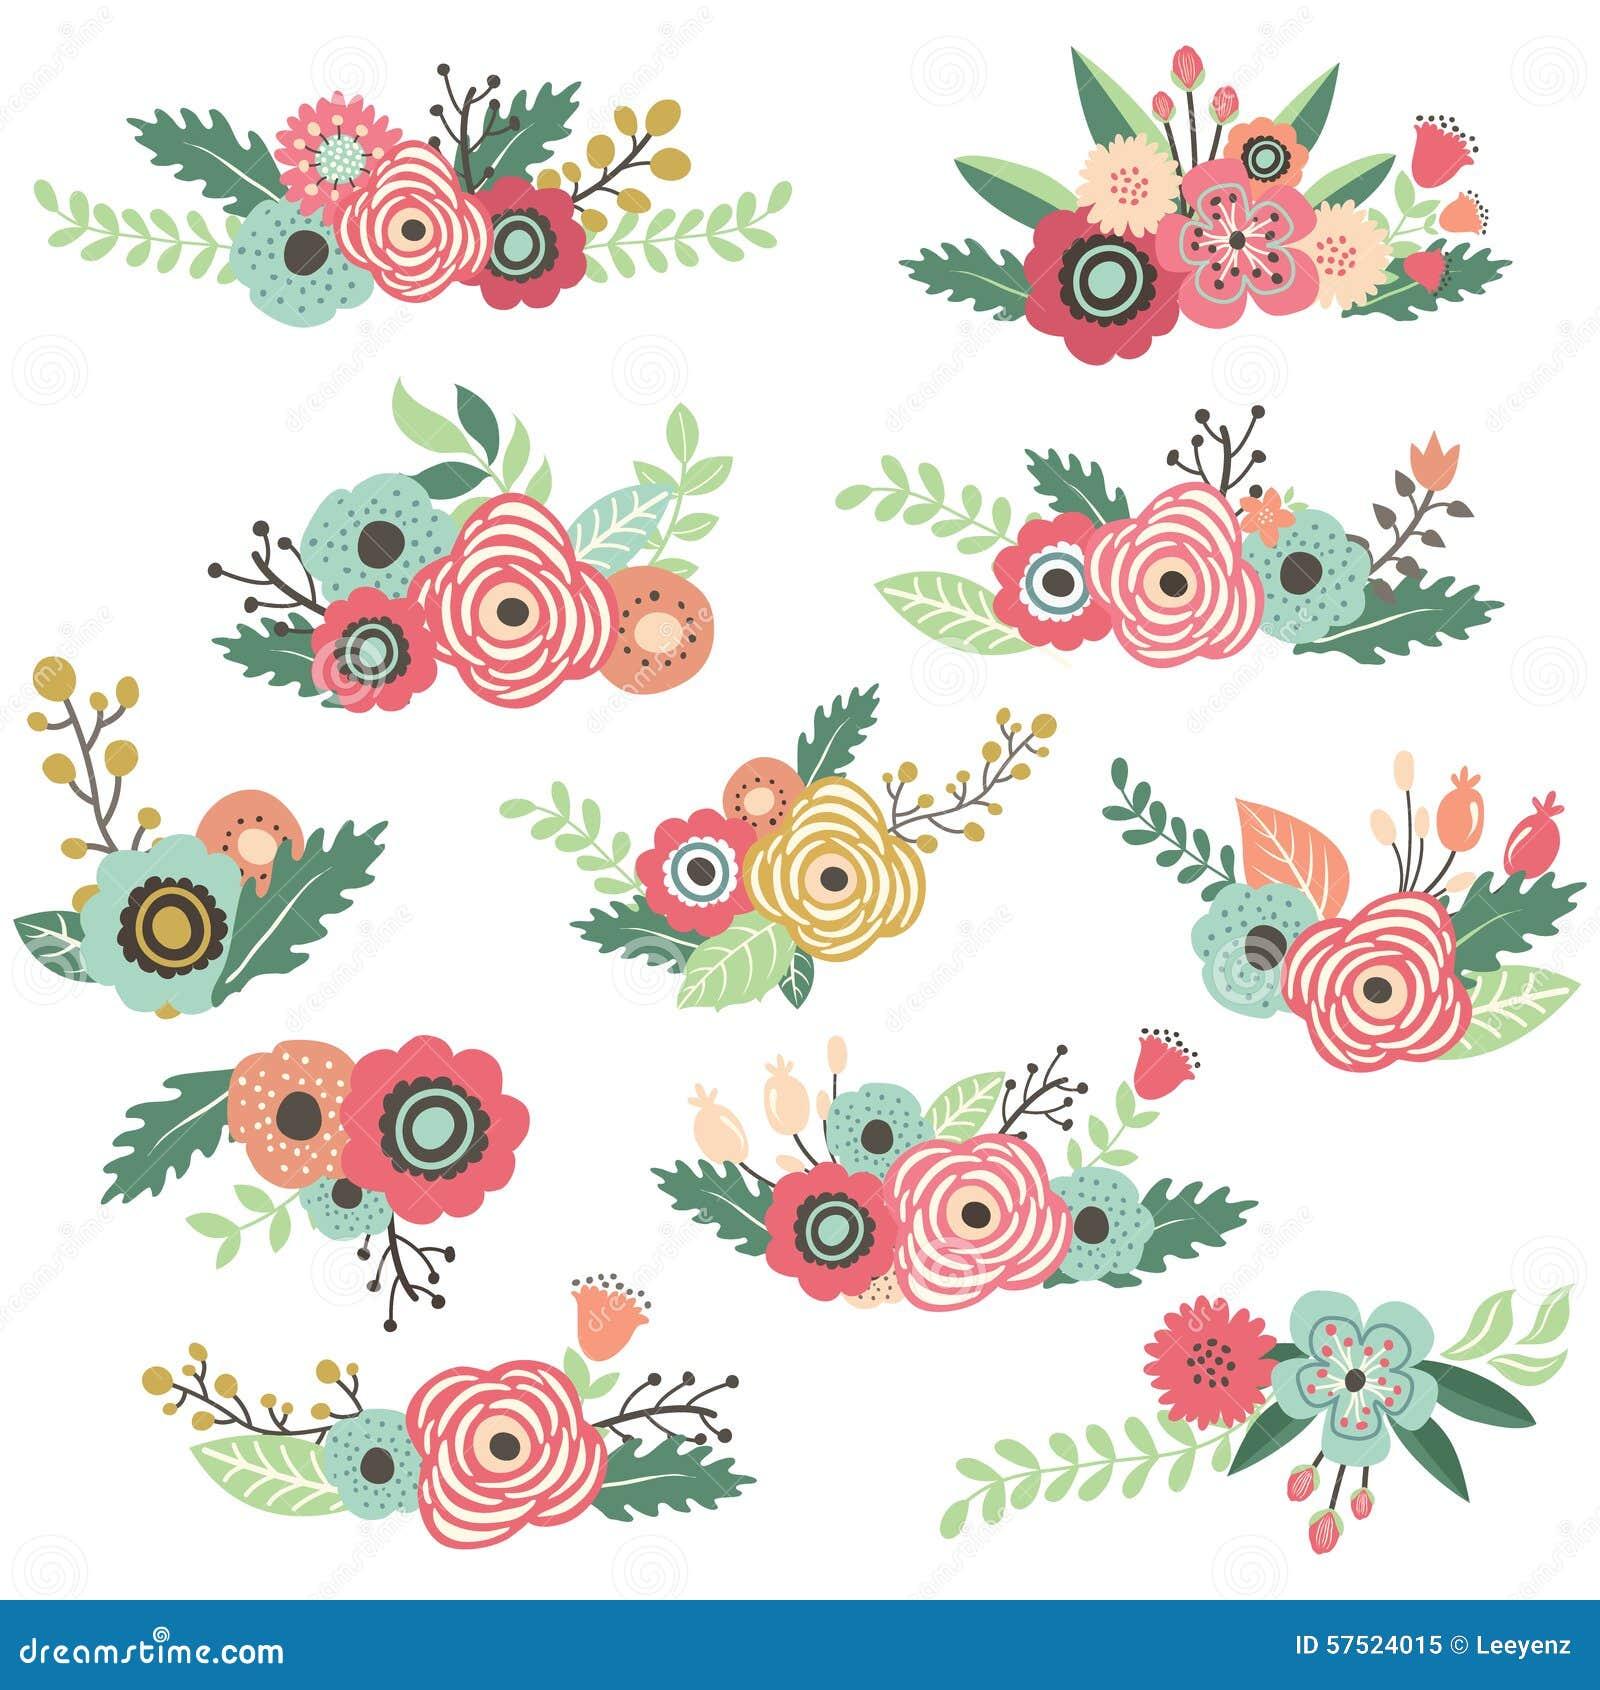 Line Art Flower Vector Free Download : Vintage hand drawn floral bouquet set stock vector